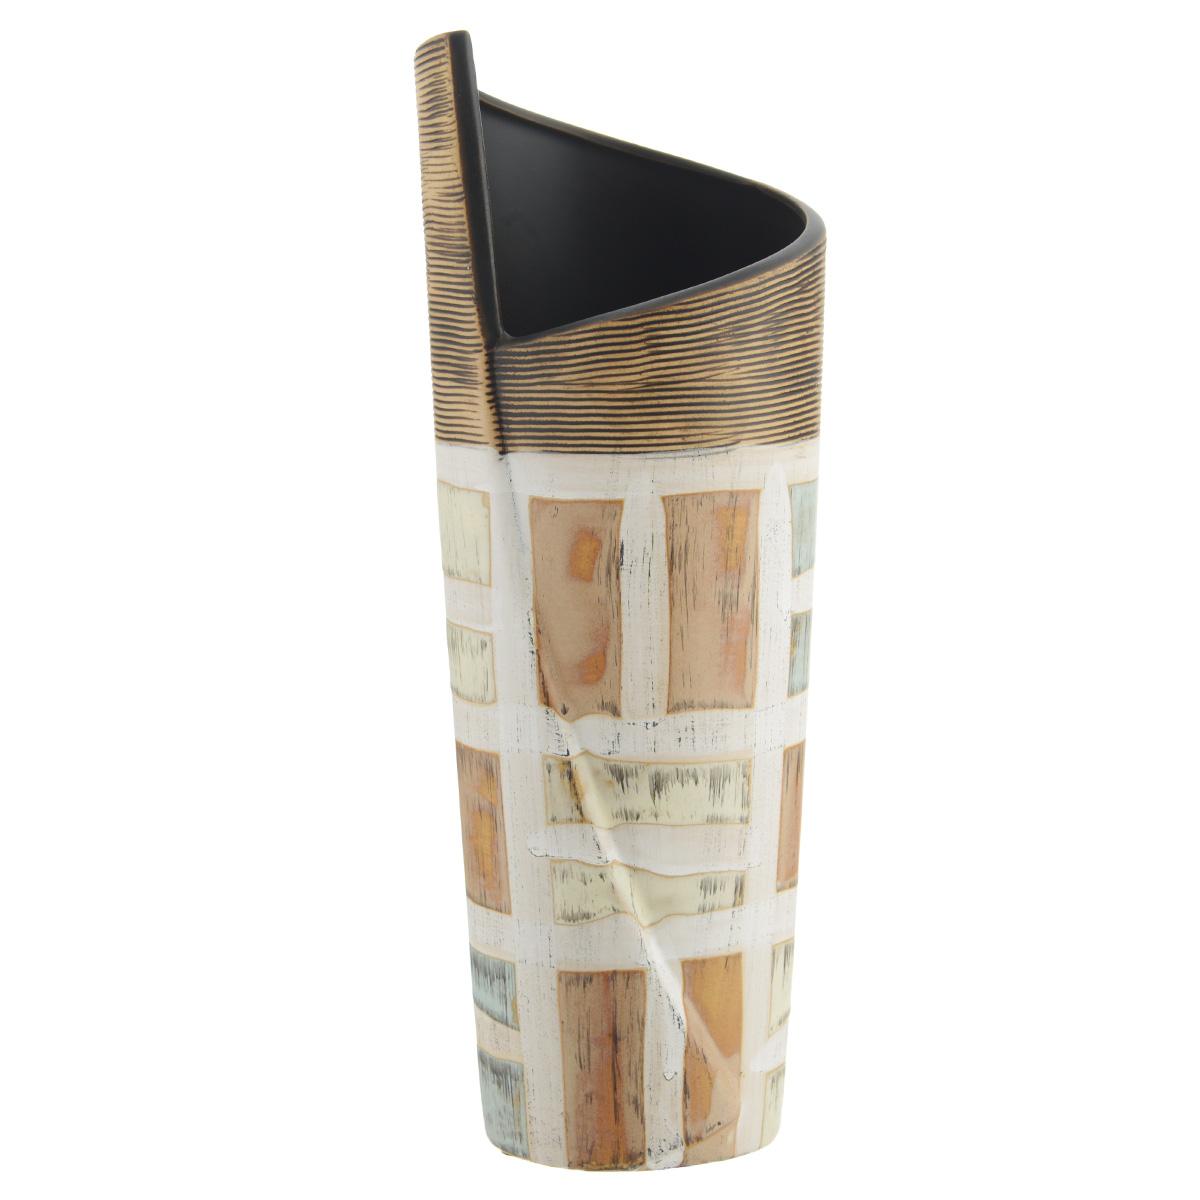 Ваза декоративная Геометрия M, высота 30,5 см вазы pavone ваза розы маньчжурии